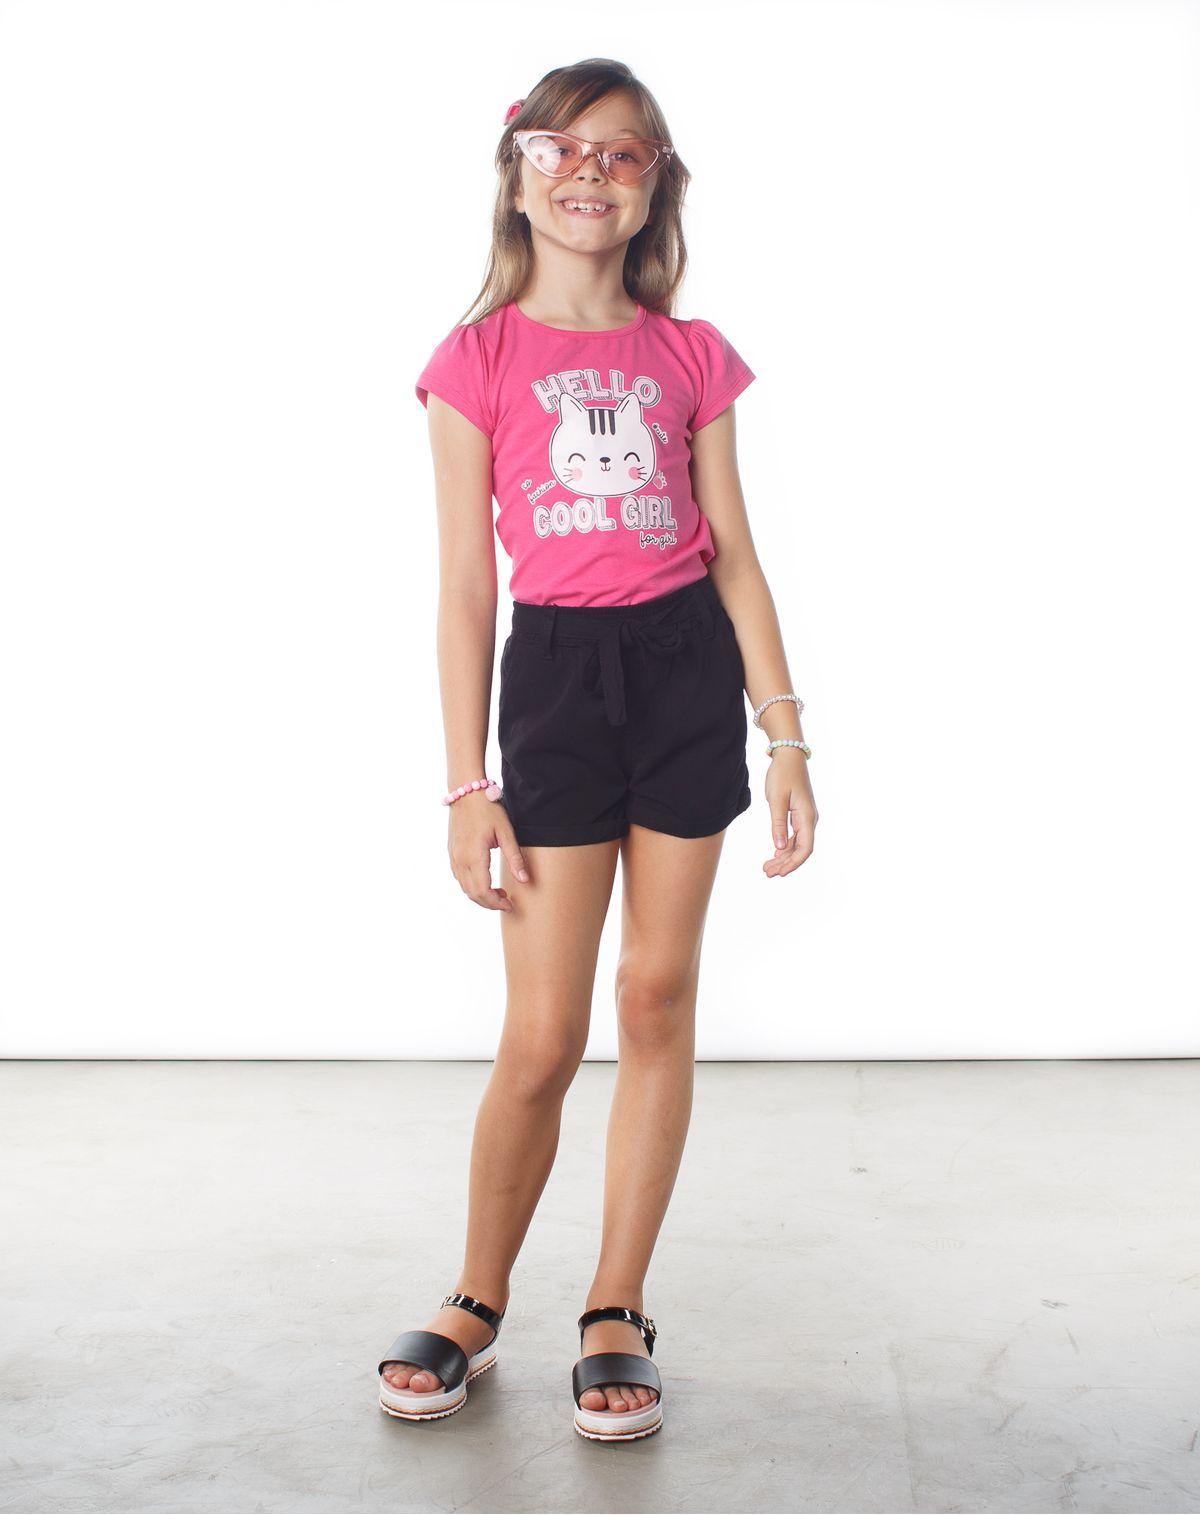 567757002-short-malha-infantil-menina-amarracao-bolsos-preto-6-0f5